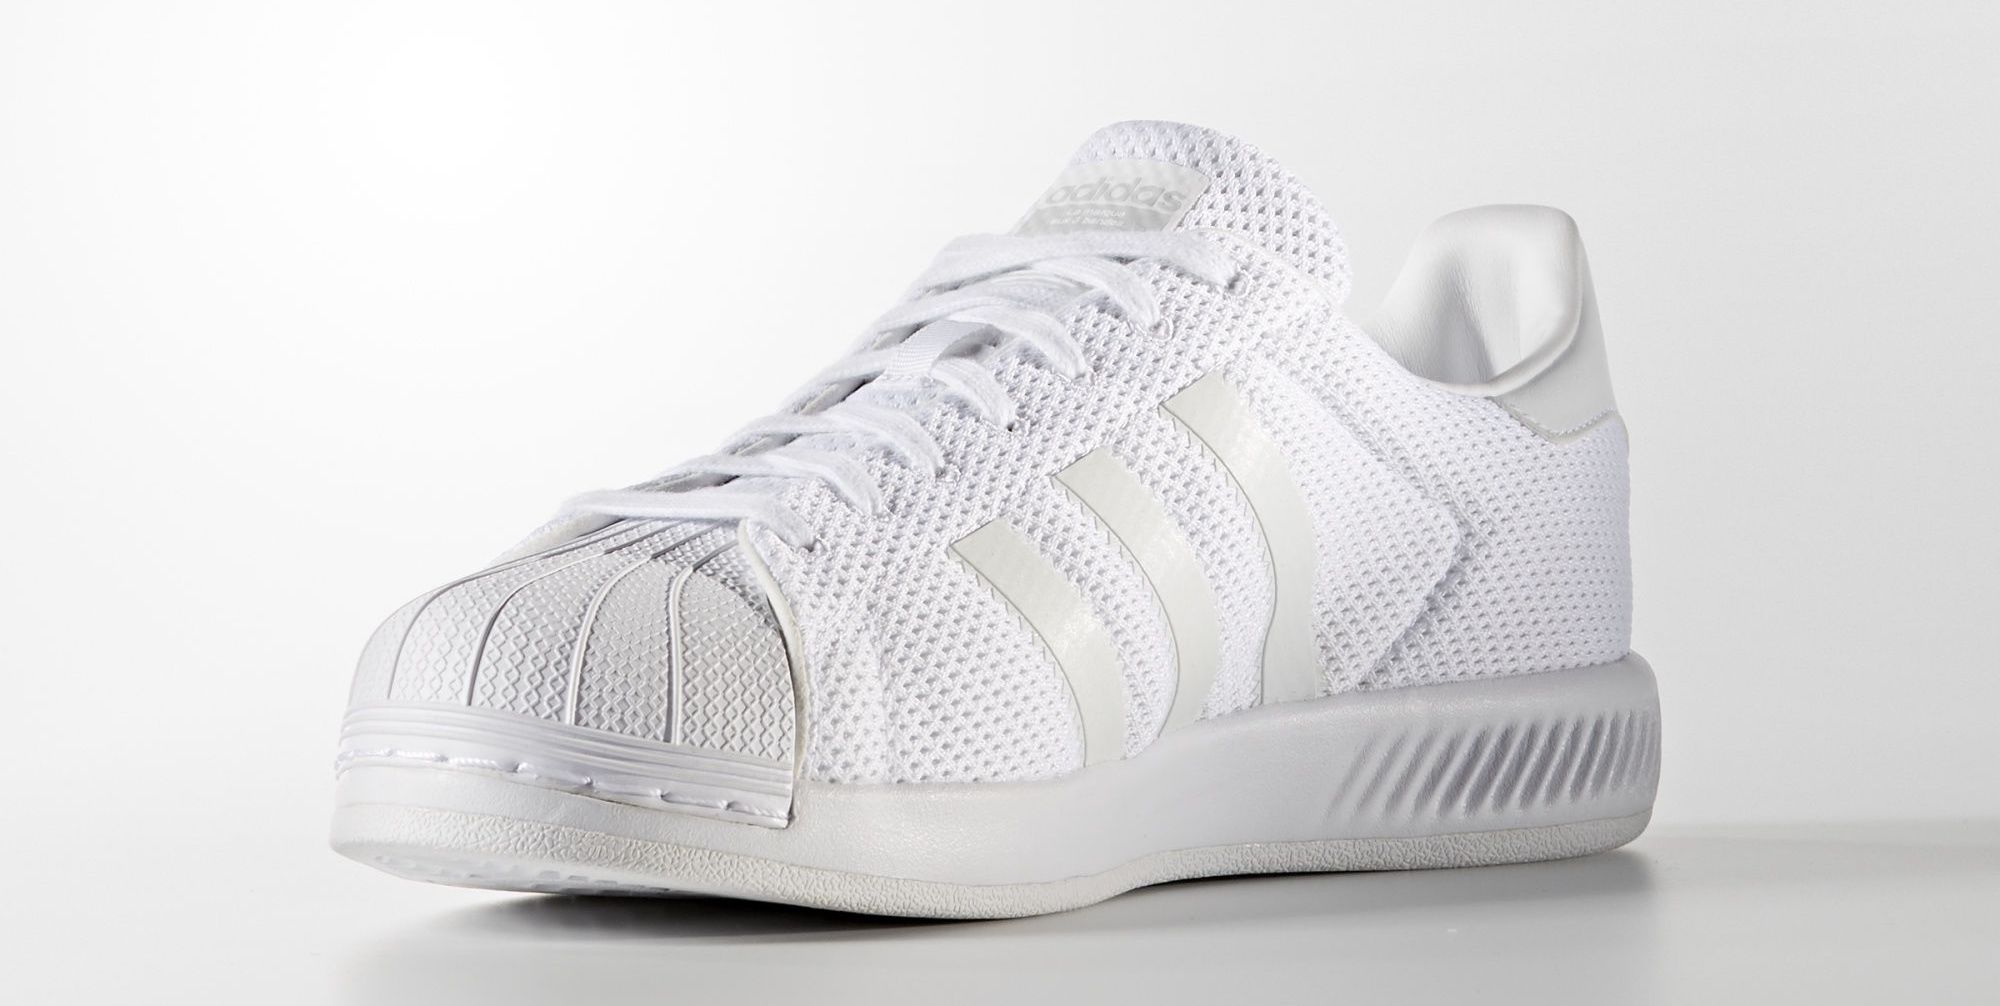 Adidas Superstar Menns 9 3yekUpW